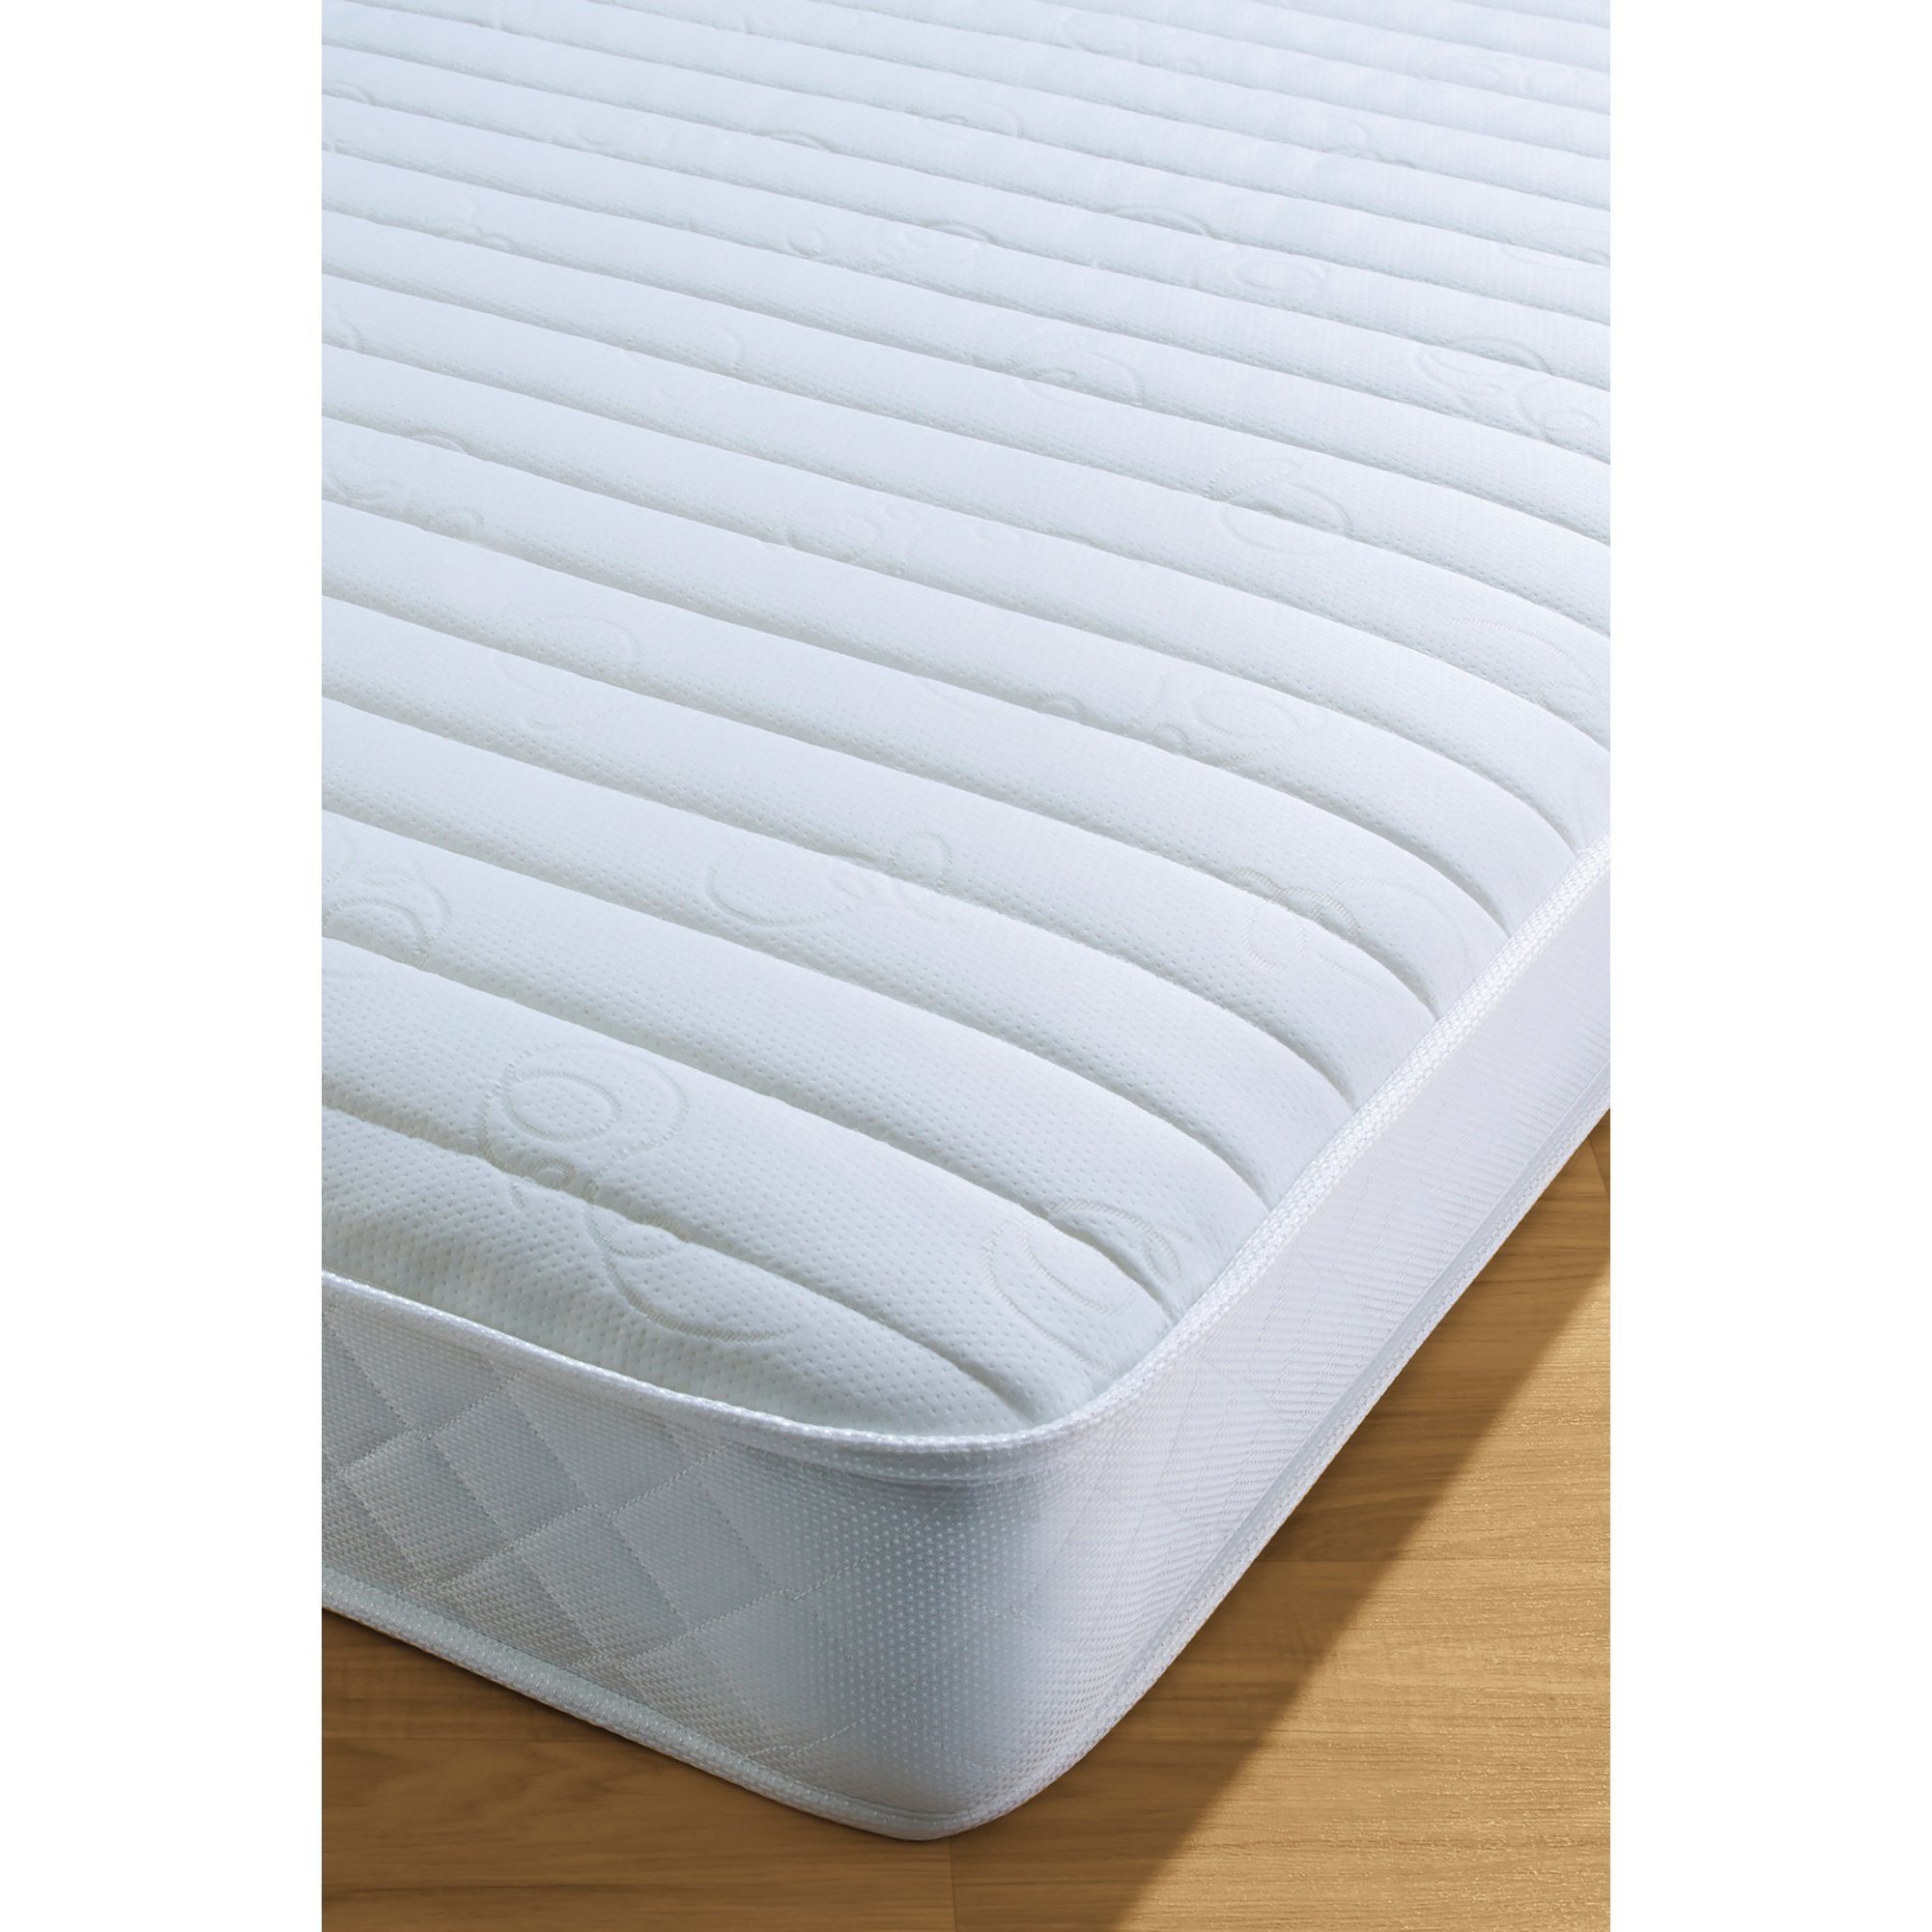 Image of Airsprung Comfort Mattress - Latex